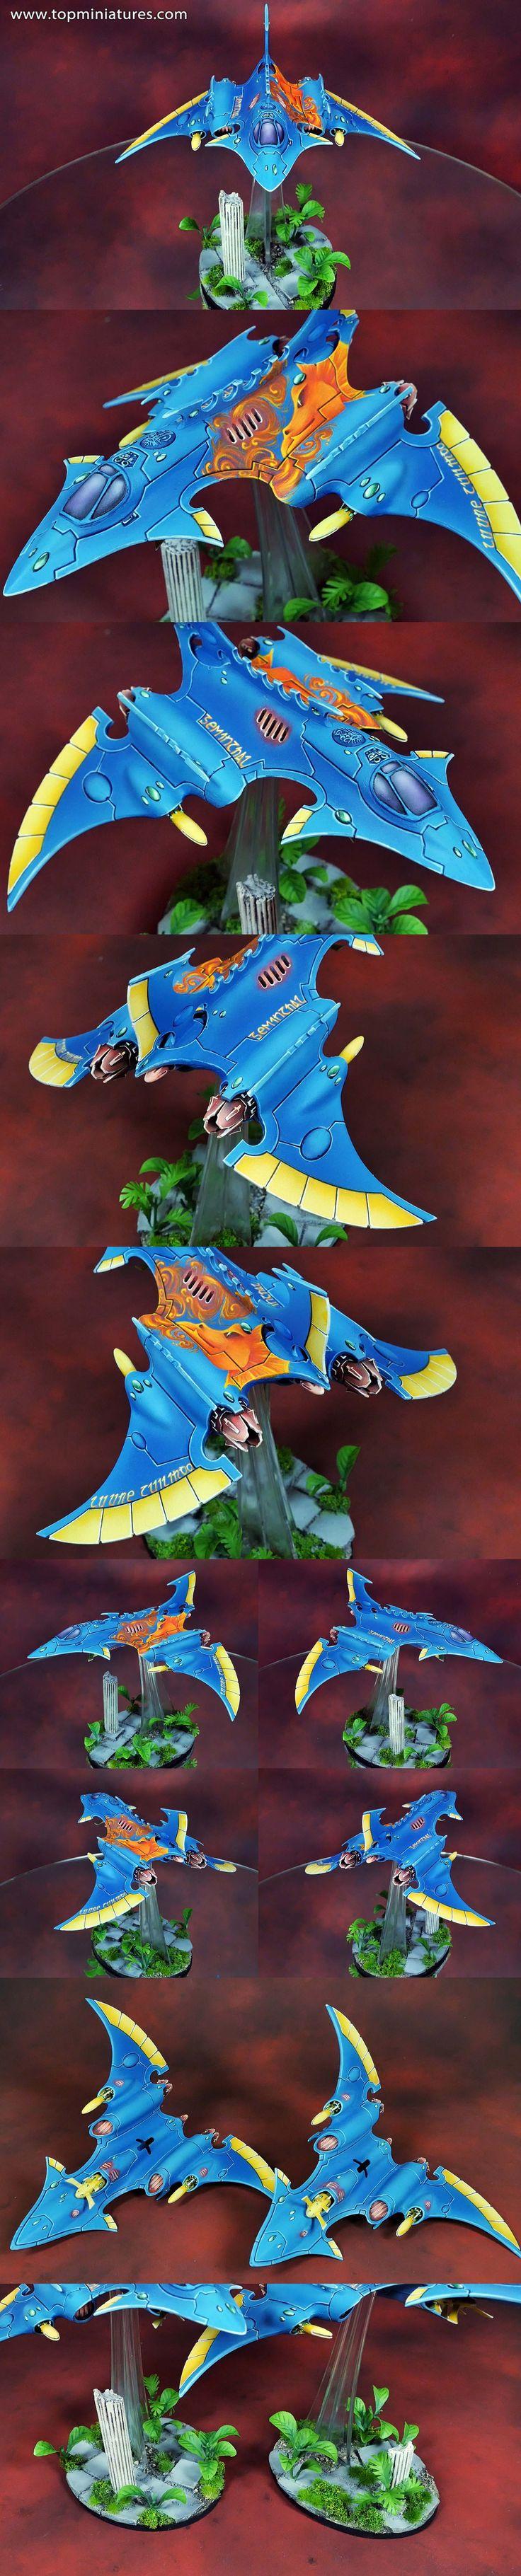 Warhammer 40k elder hemlock wraithfighter with dragon freehand